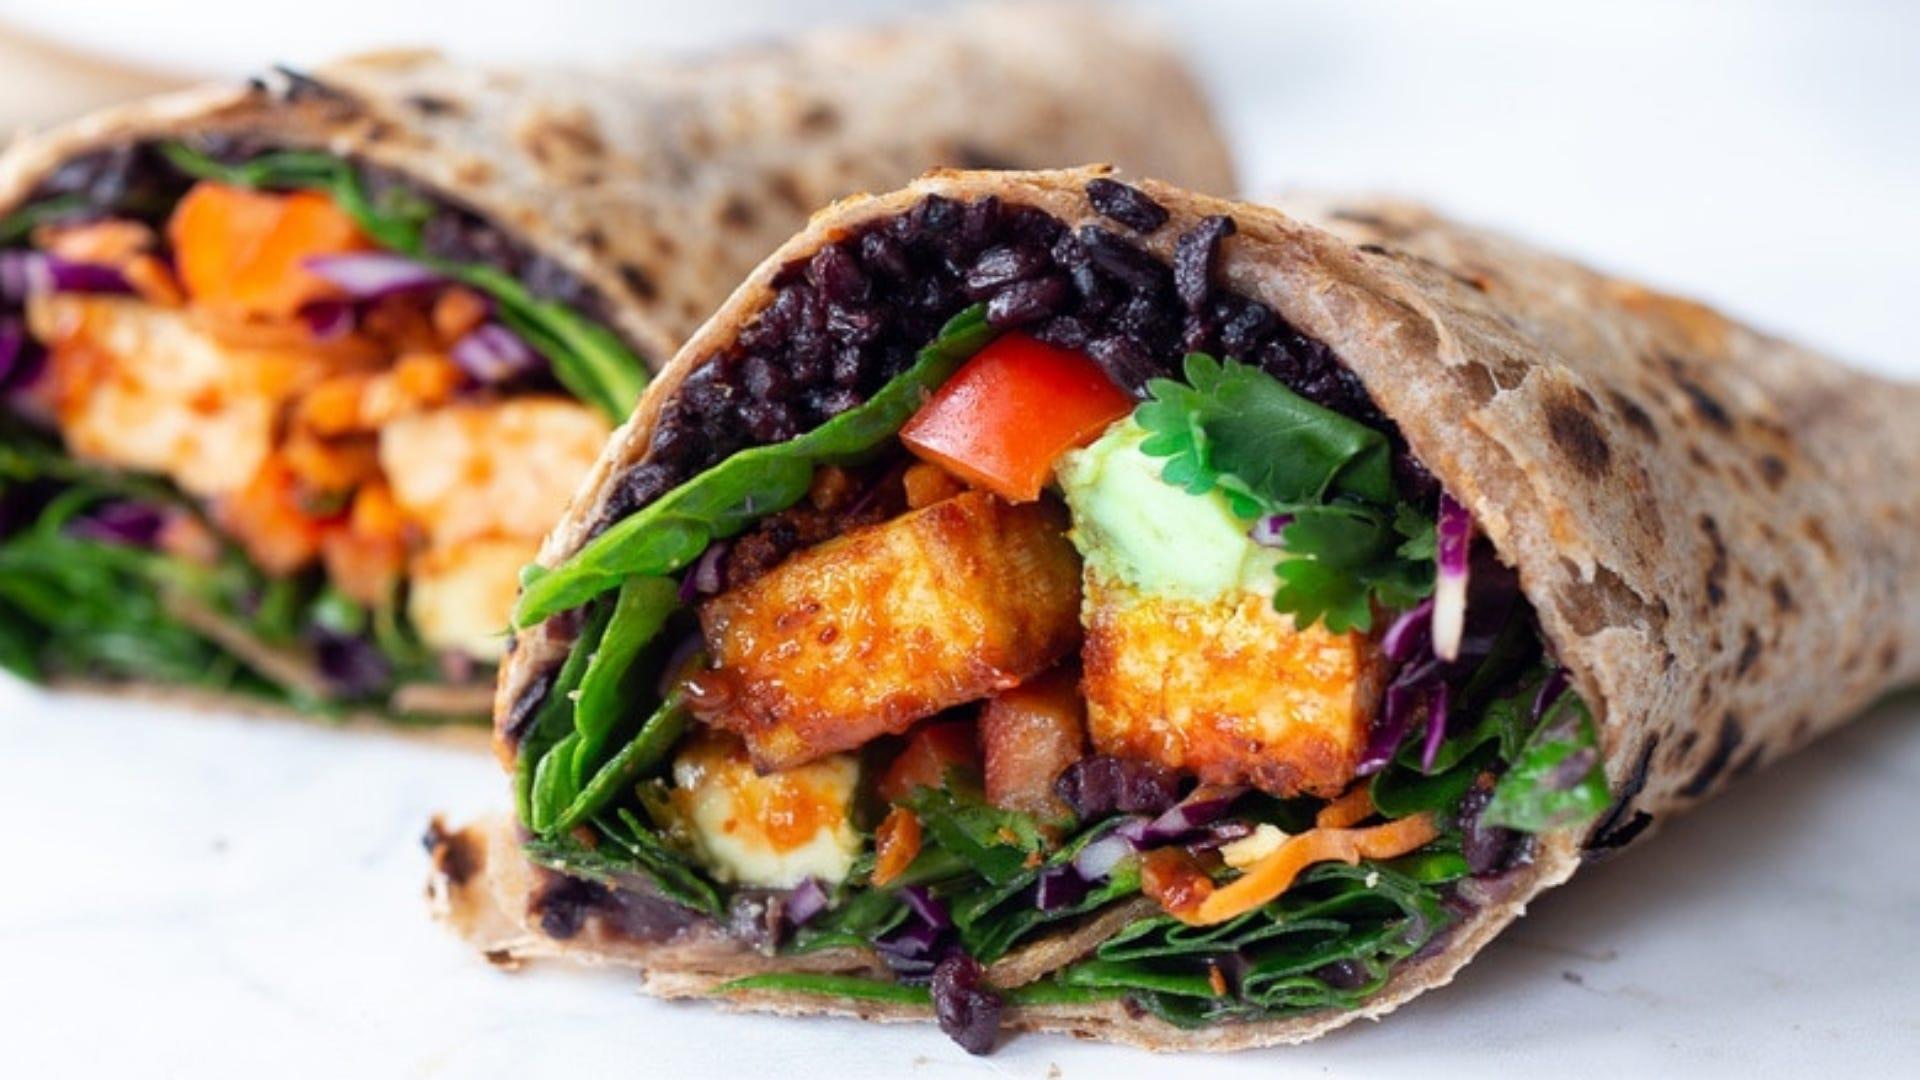 Burrito with black rice, peanut tofu, and greens inside